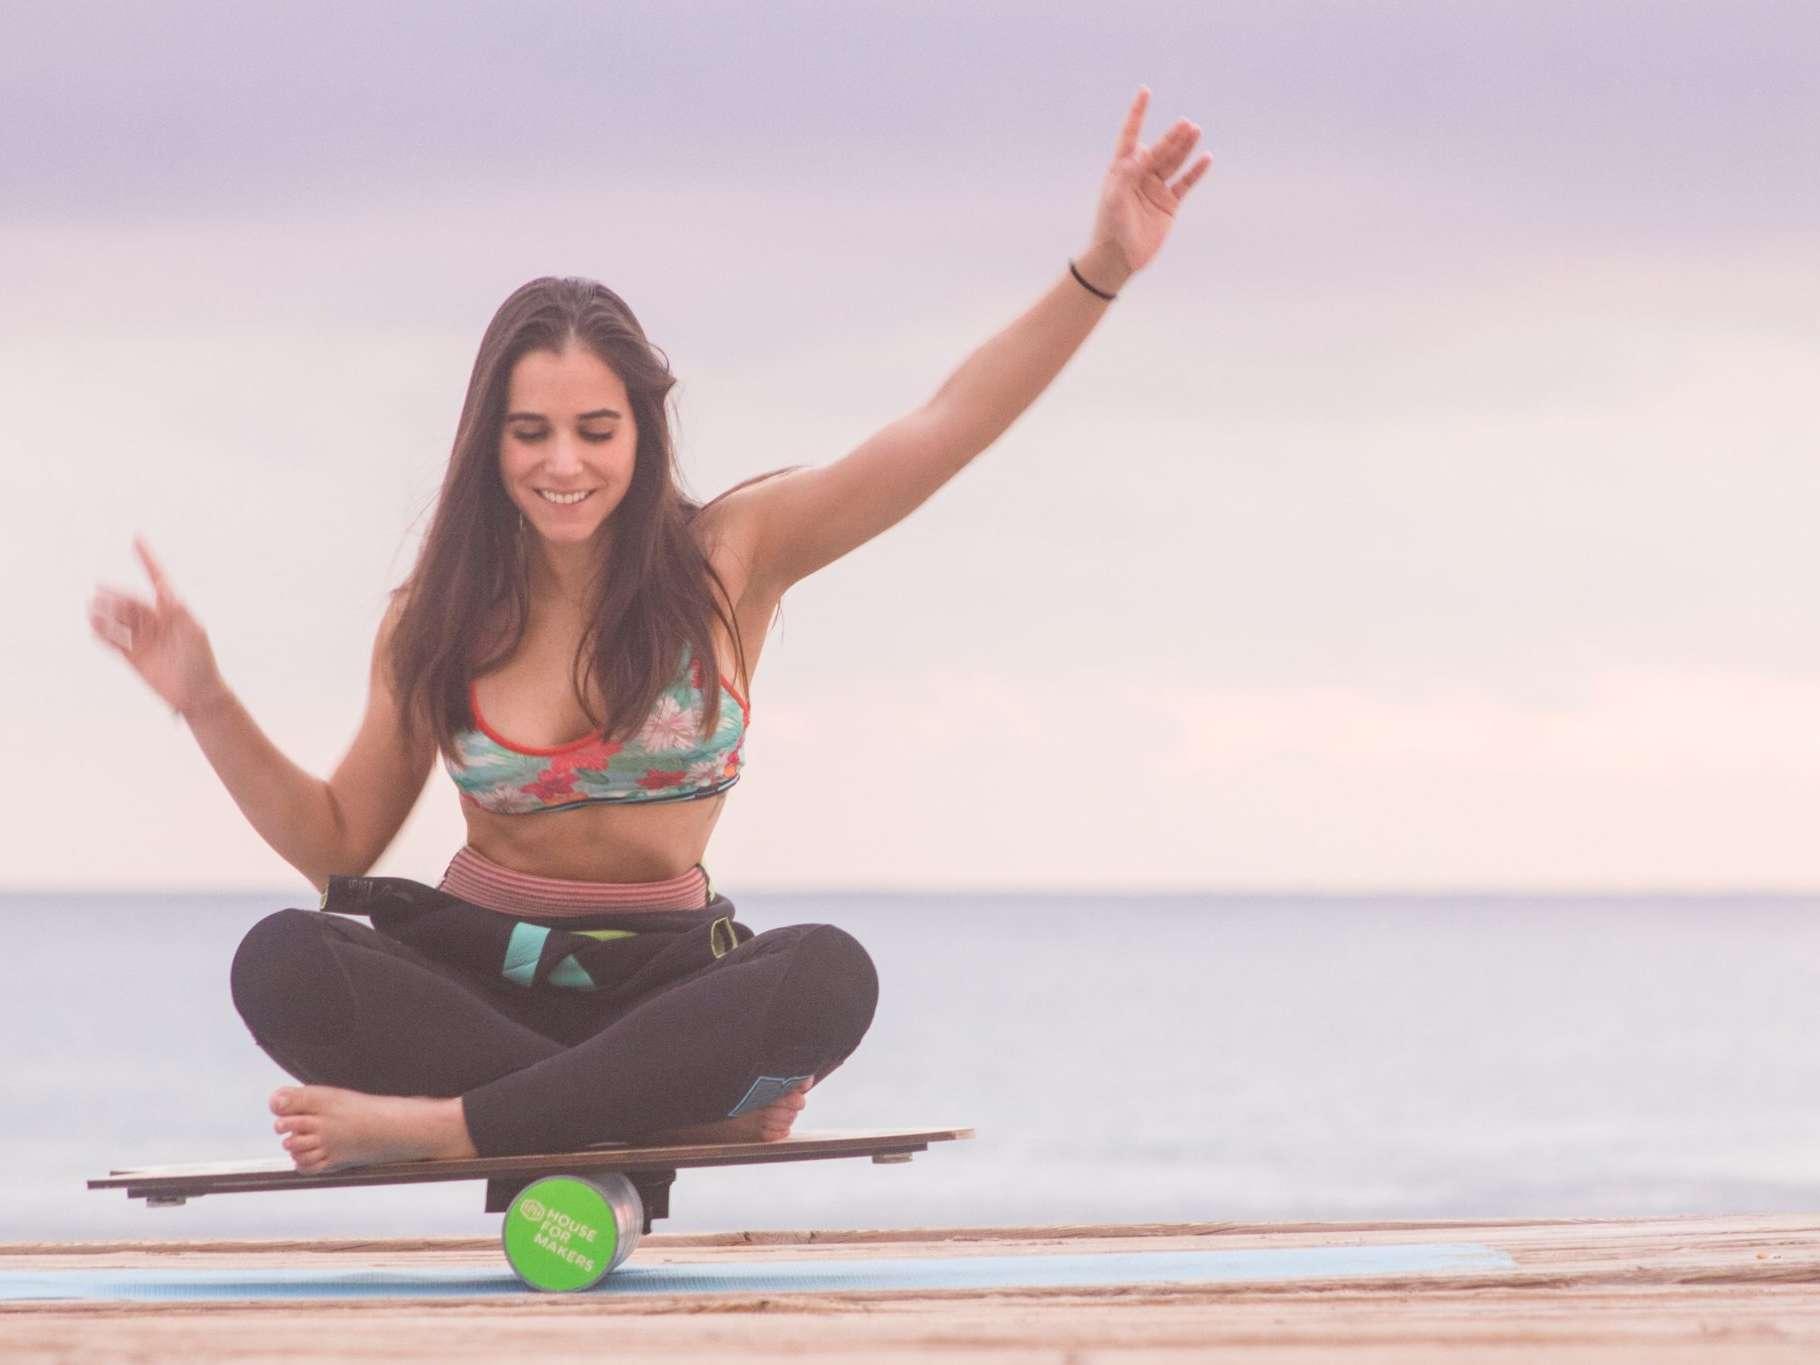 girl balancing on board